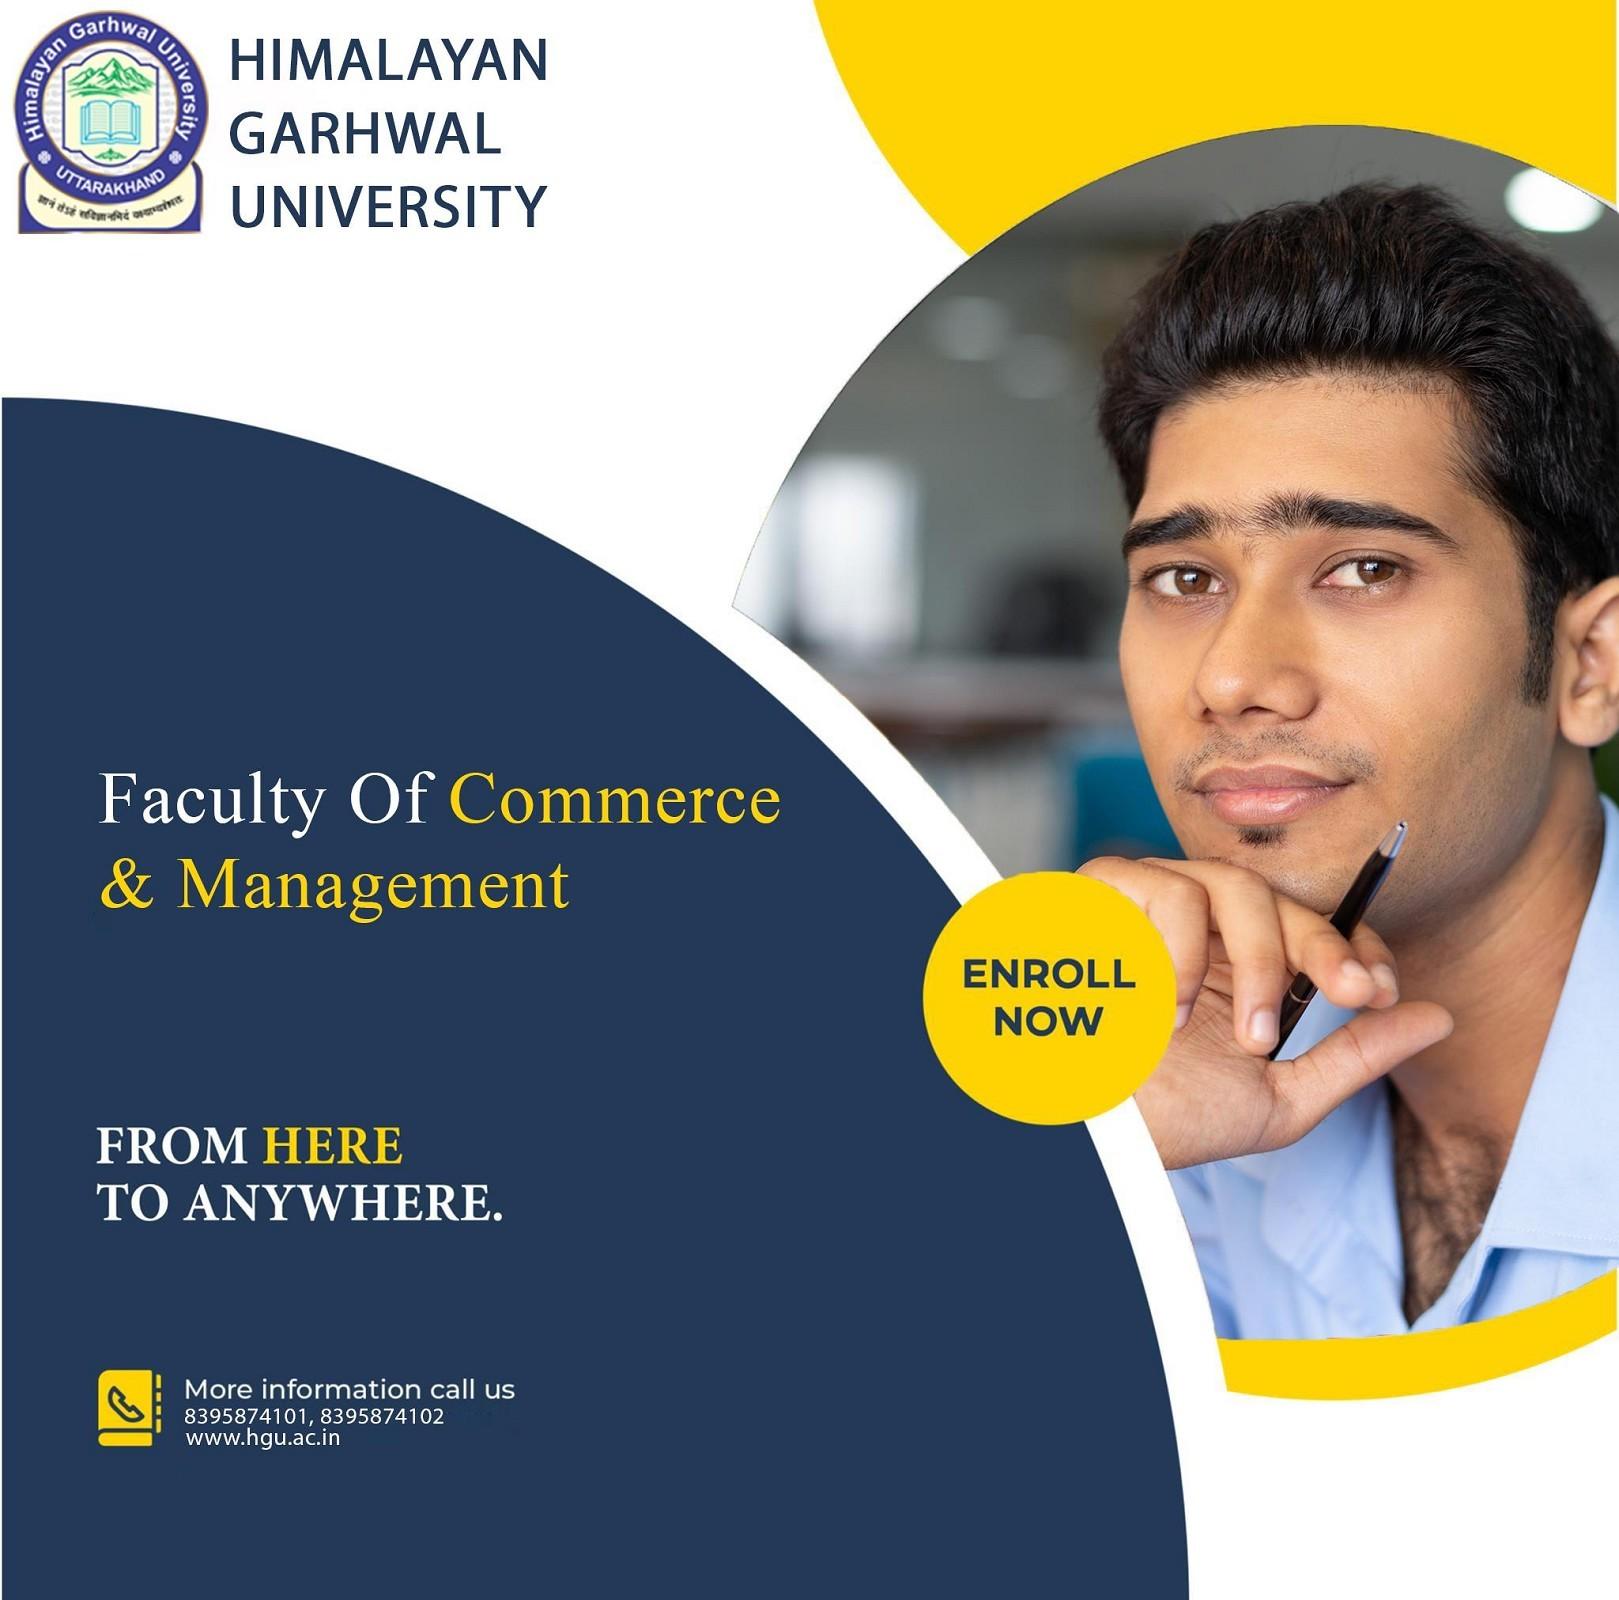 Himalayan Garhwal University Admission open: Post Graduate degree